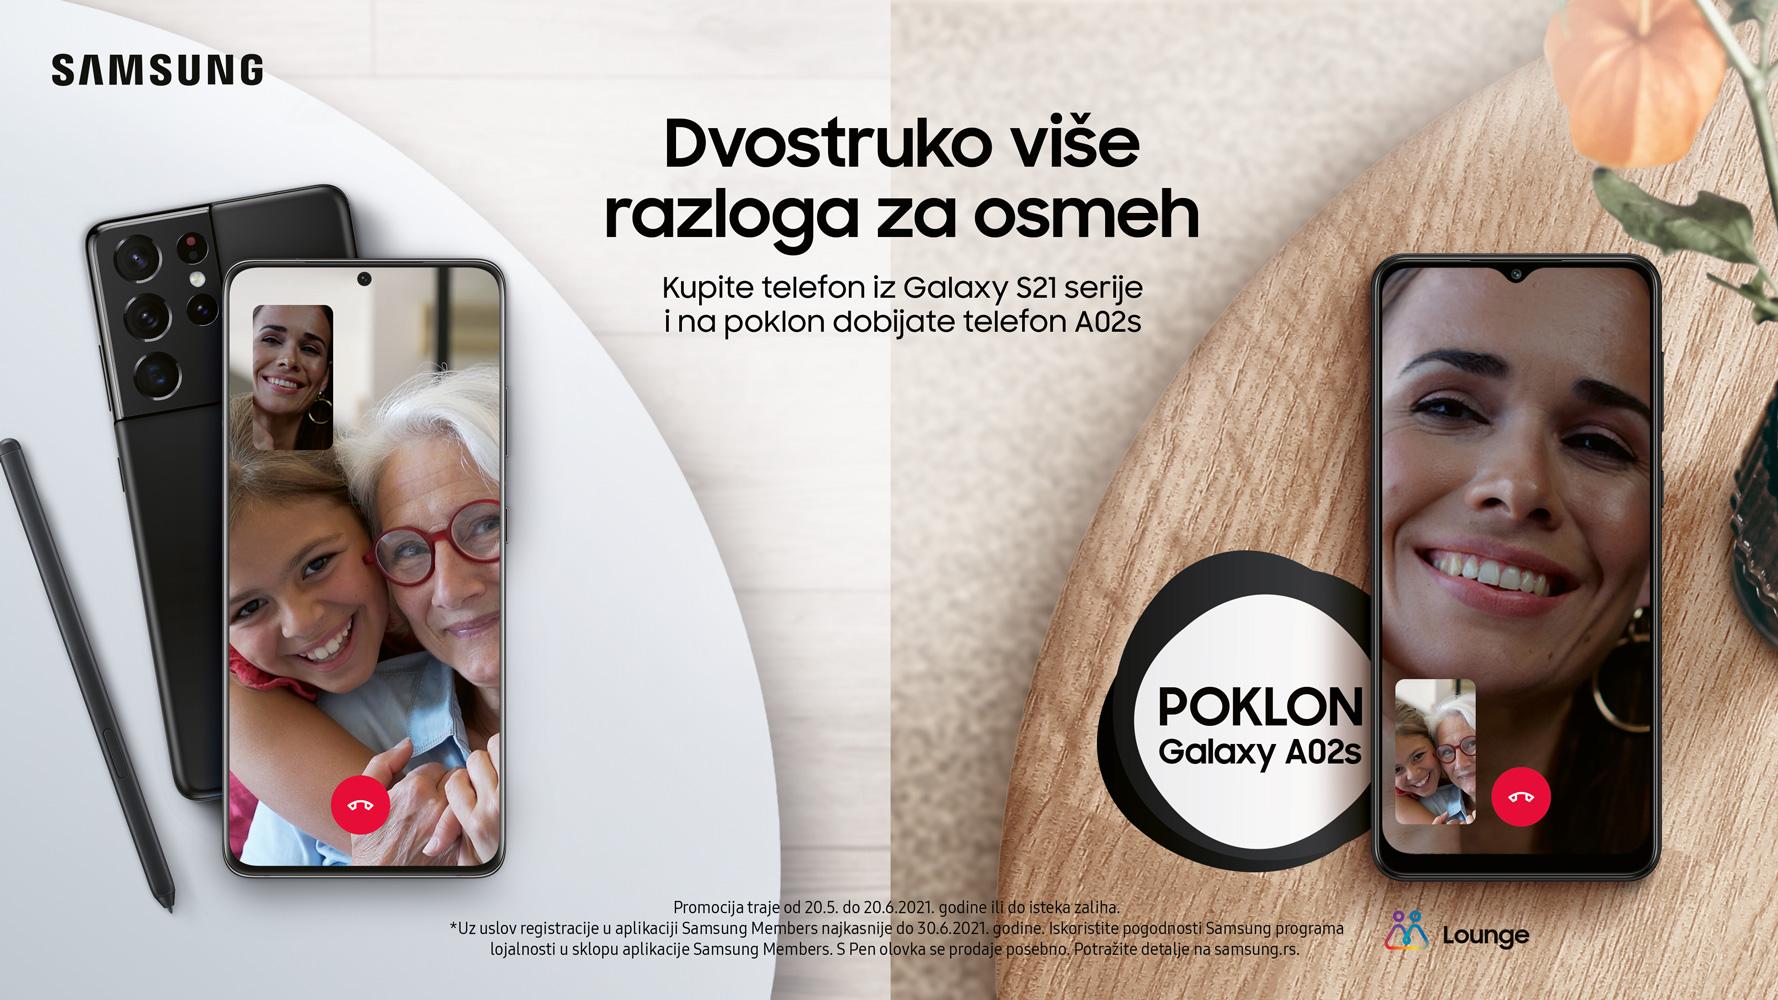 Samsung Galaxy S21 + poklon A02s